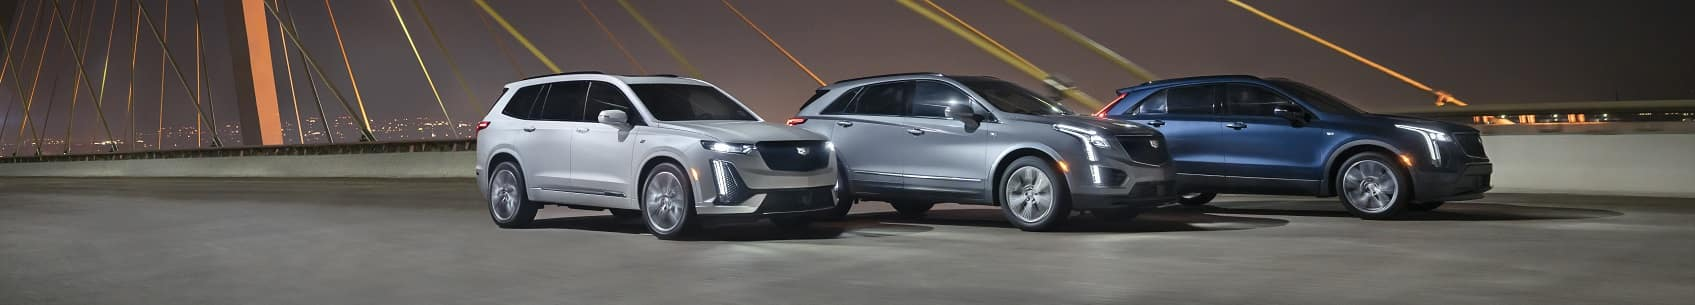 Cadillac XT6 for Sale Colorado Springs CO